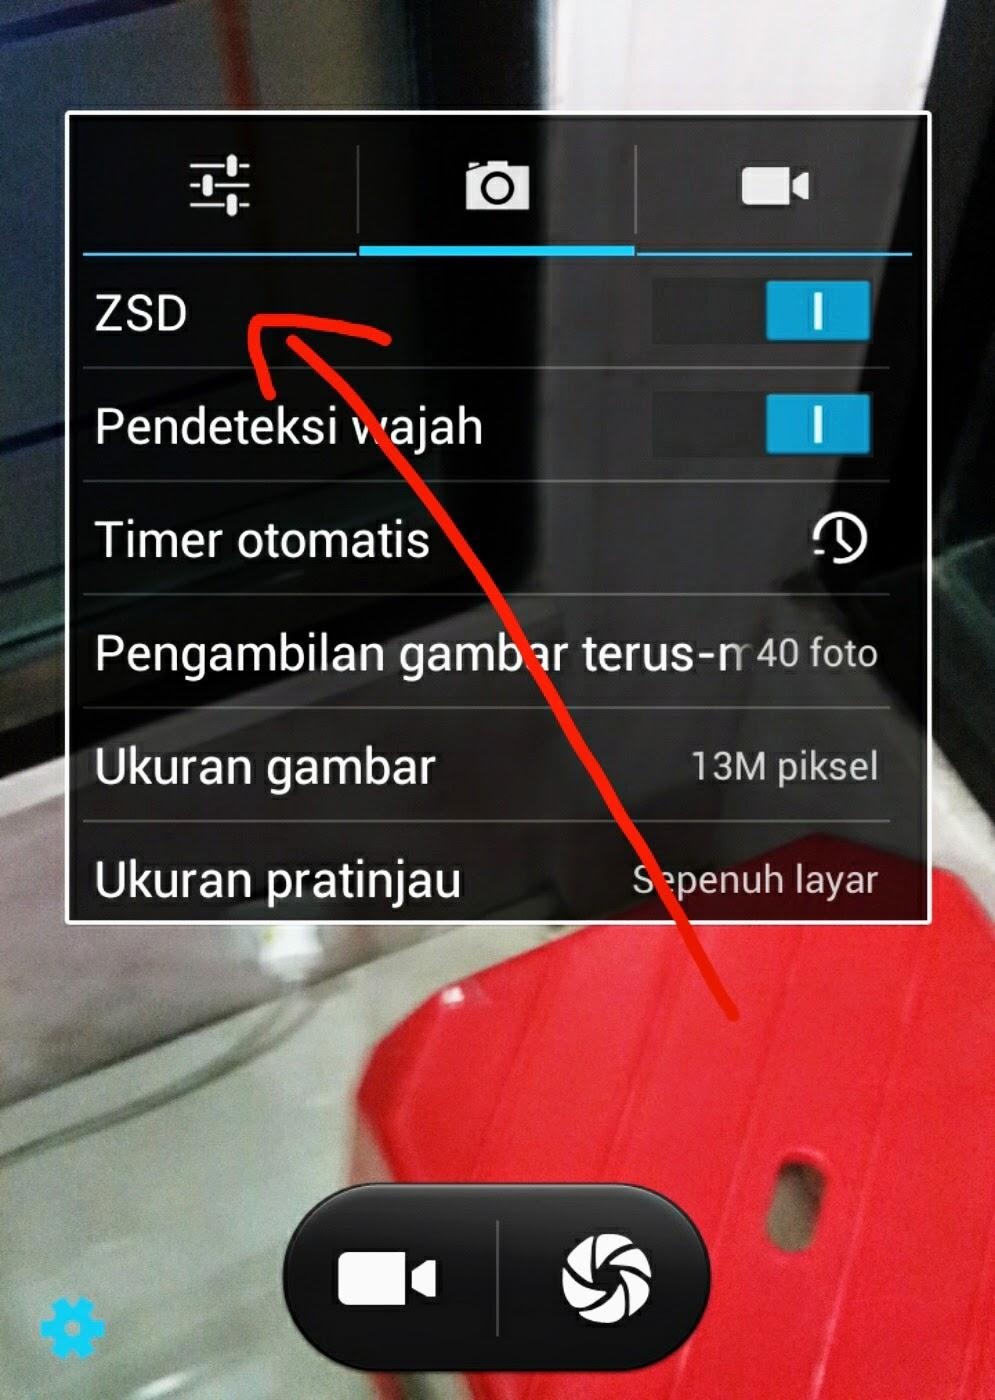 fungsi ZSD